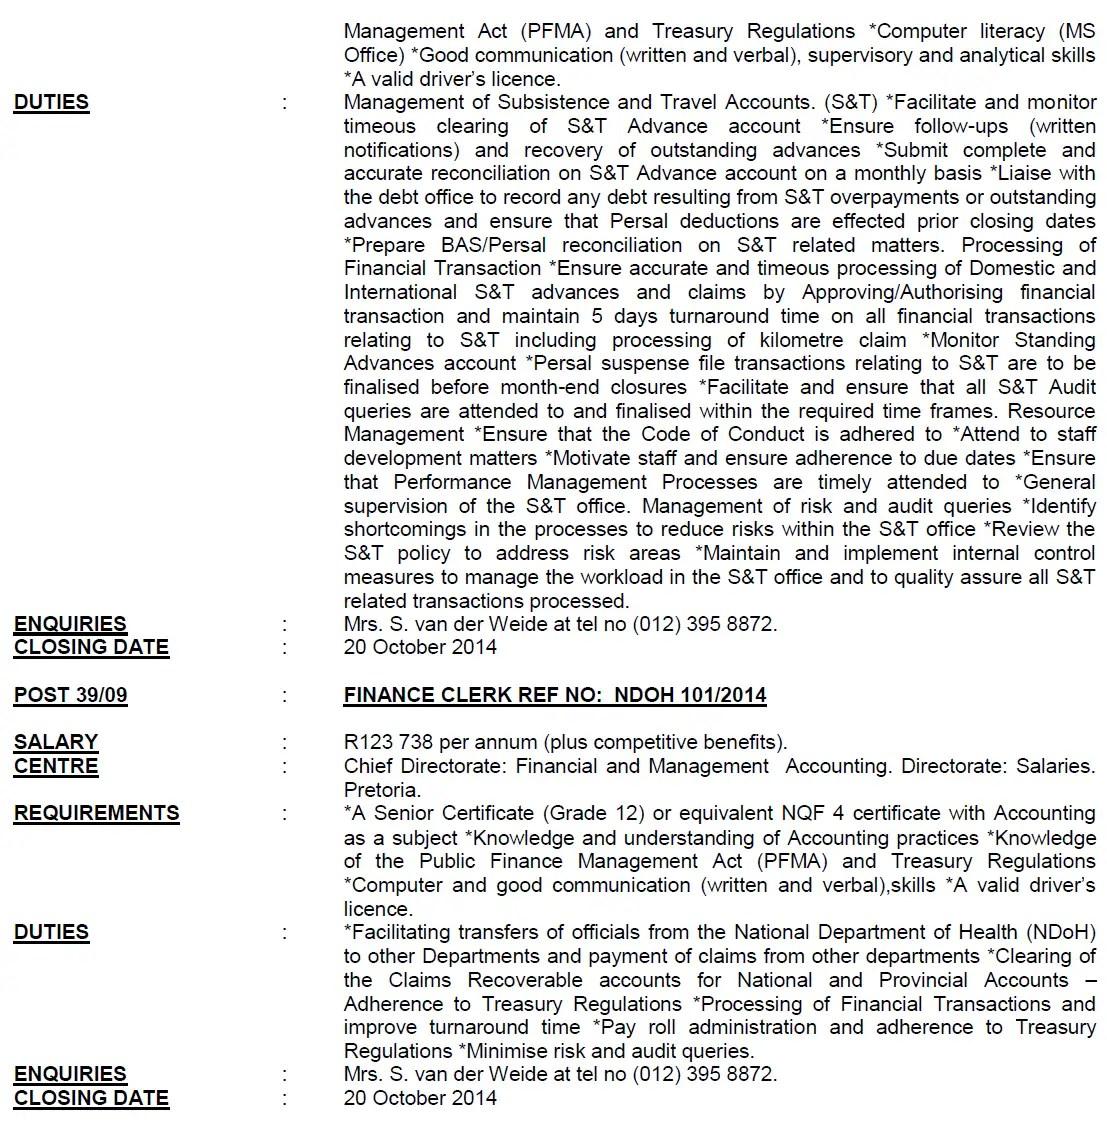 WWW DPSA GOV ZA Z83 FORM - Careers - The National School of